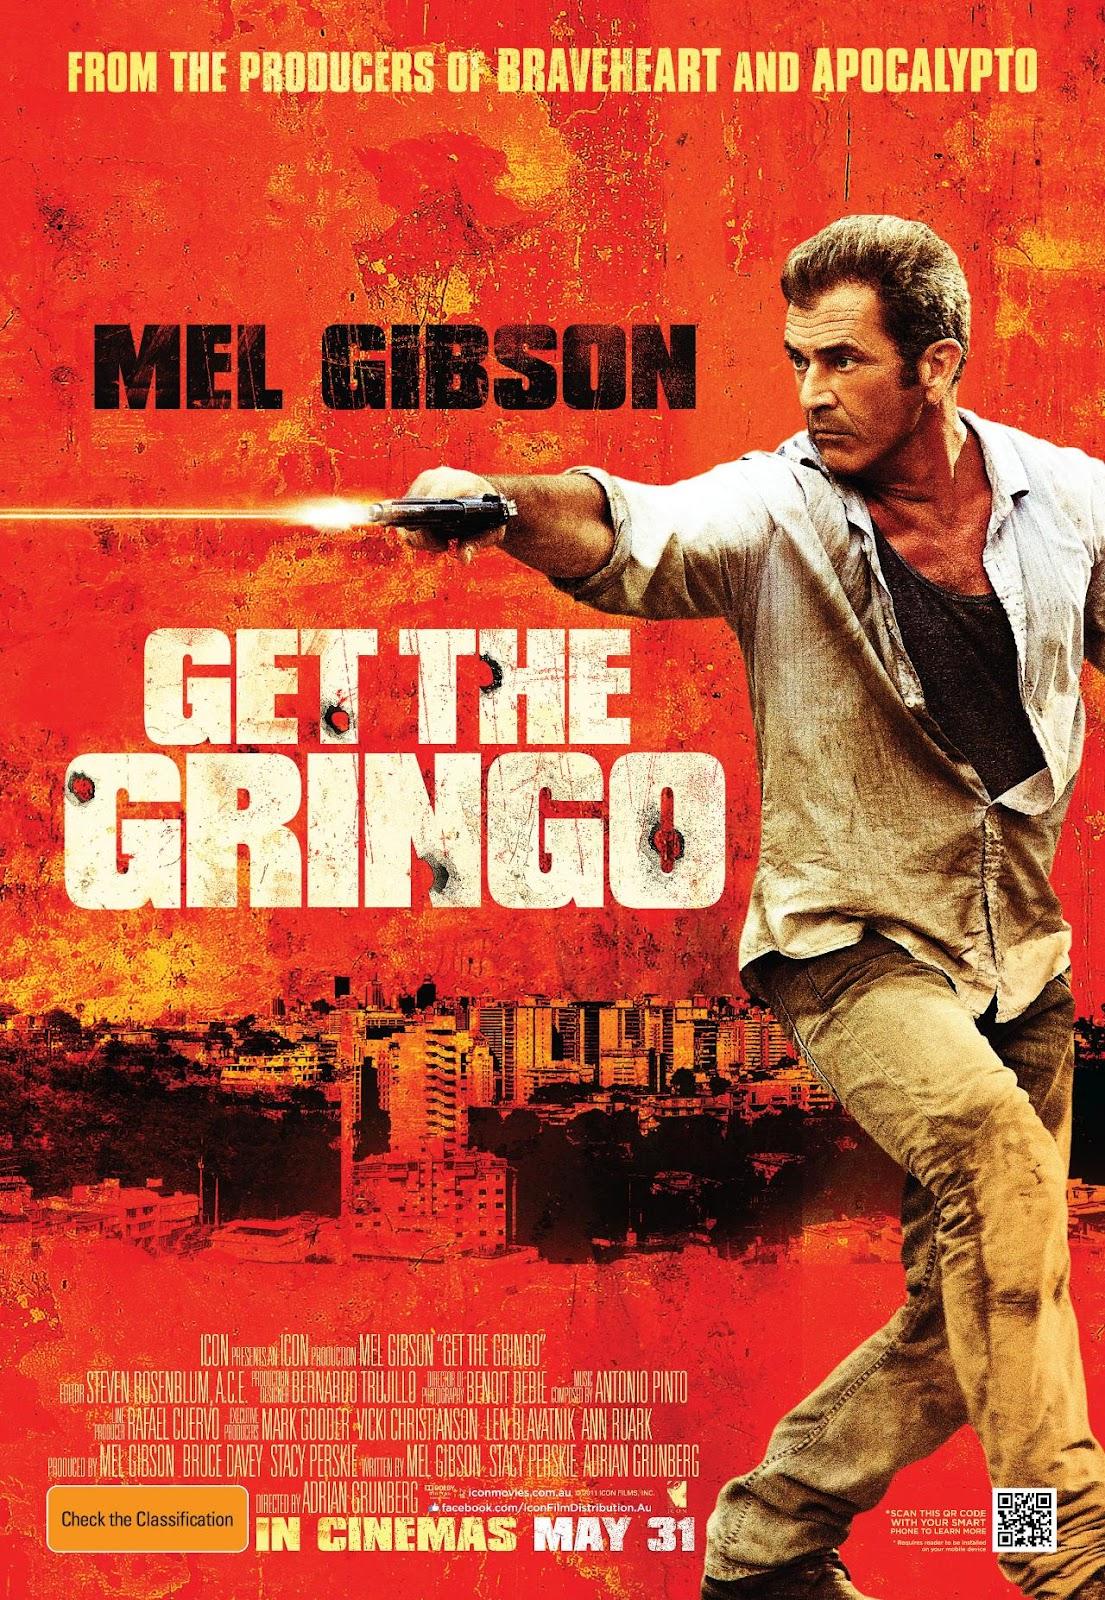 http://3.bp.blogspot.com/-YxKGQ311CYg/T7Q0ygWW0hI/AAAAAAAALos/DlDBe9prQXc/s1600/get-the-gringo.jpg